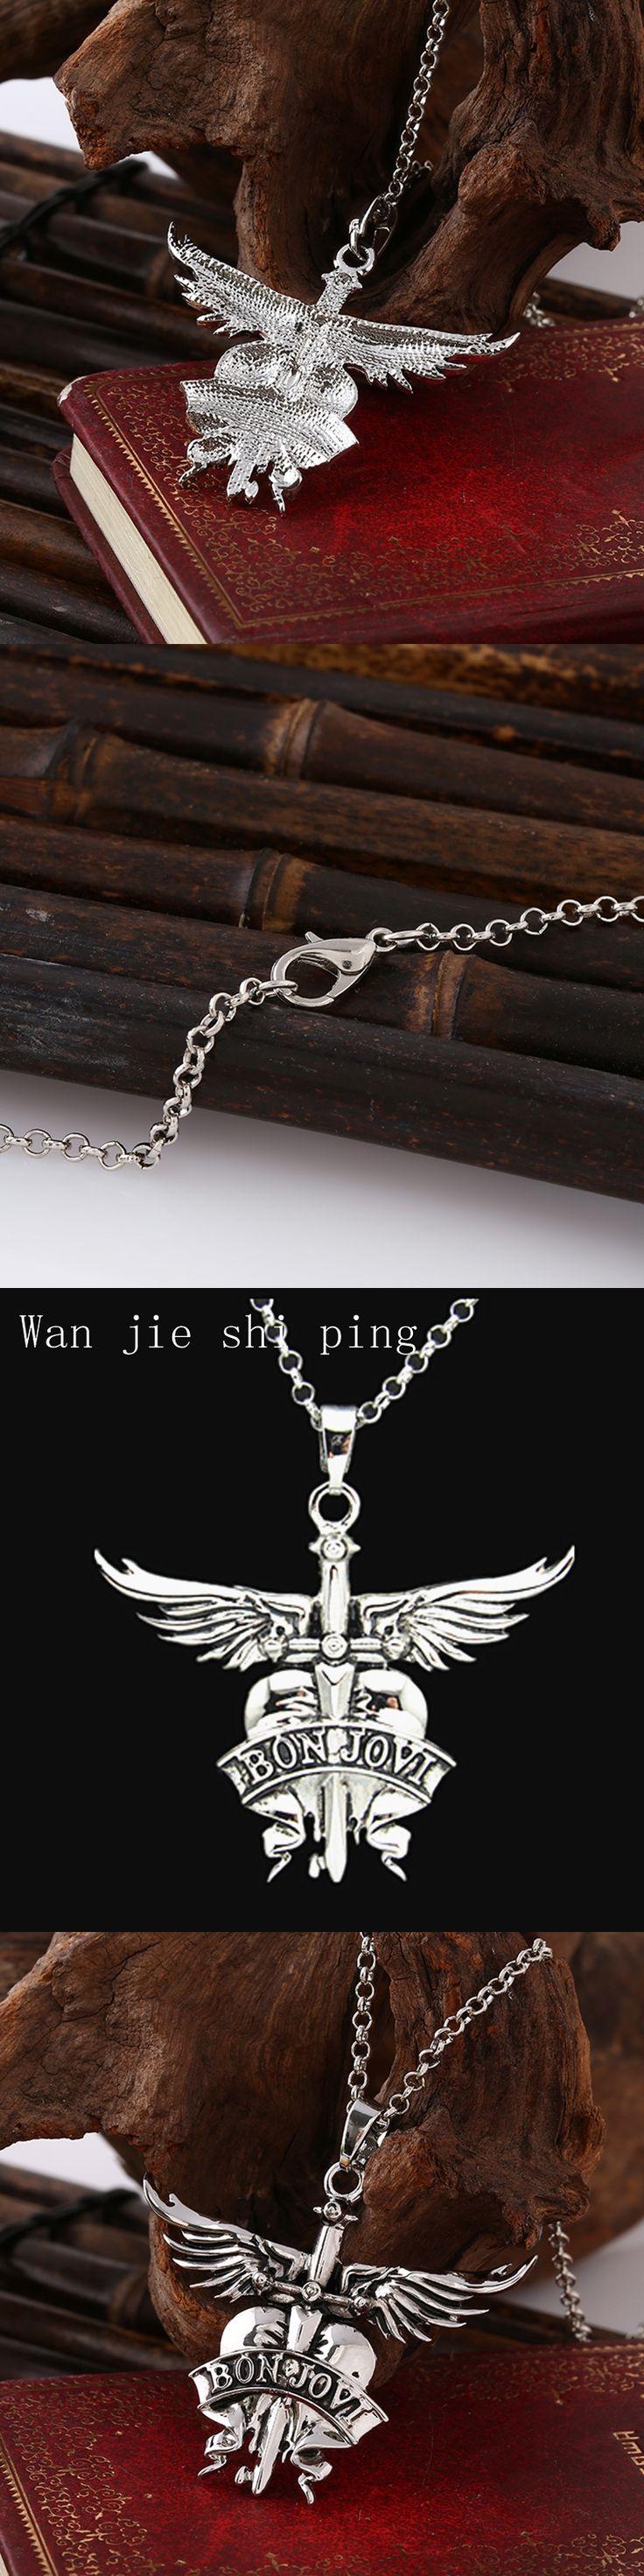 America Bon Jovi rock band necklaces pendants for men women white gold plated alloy long chain pendant necklace best friend gift